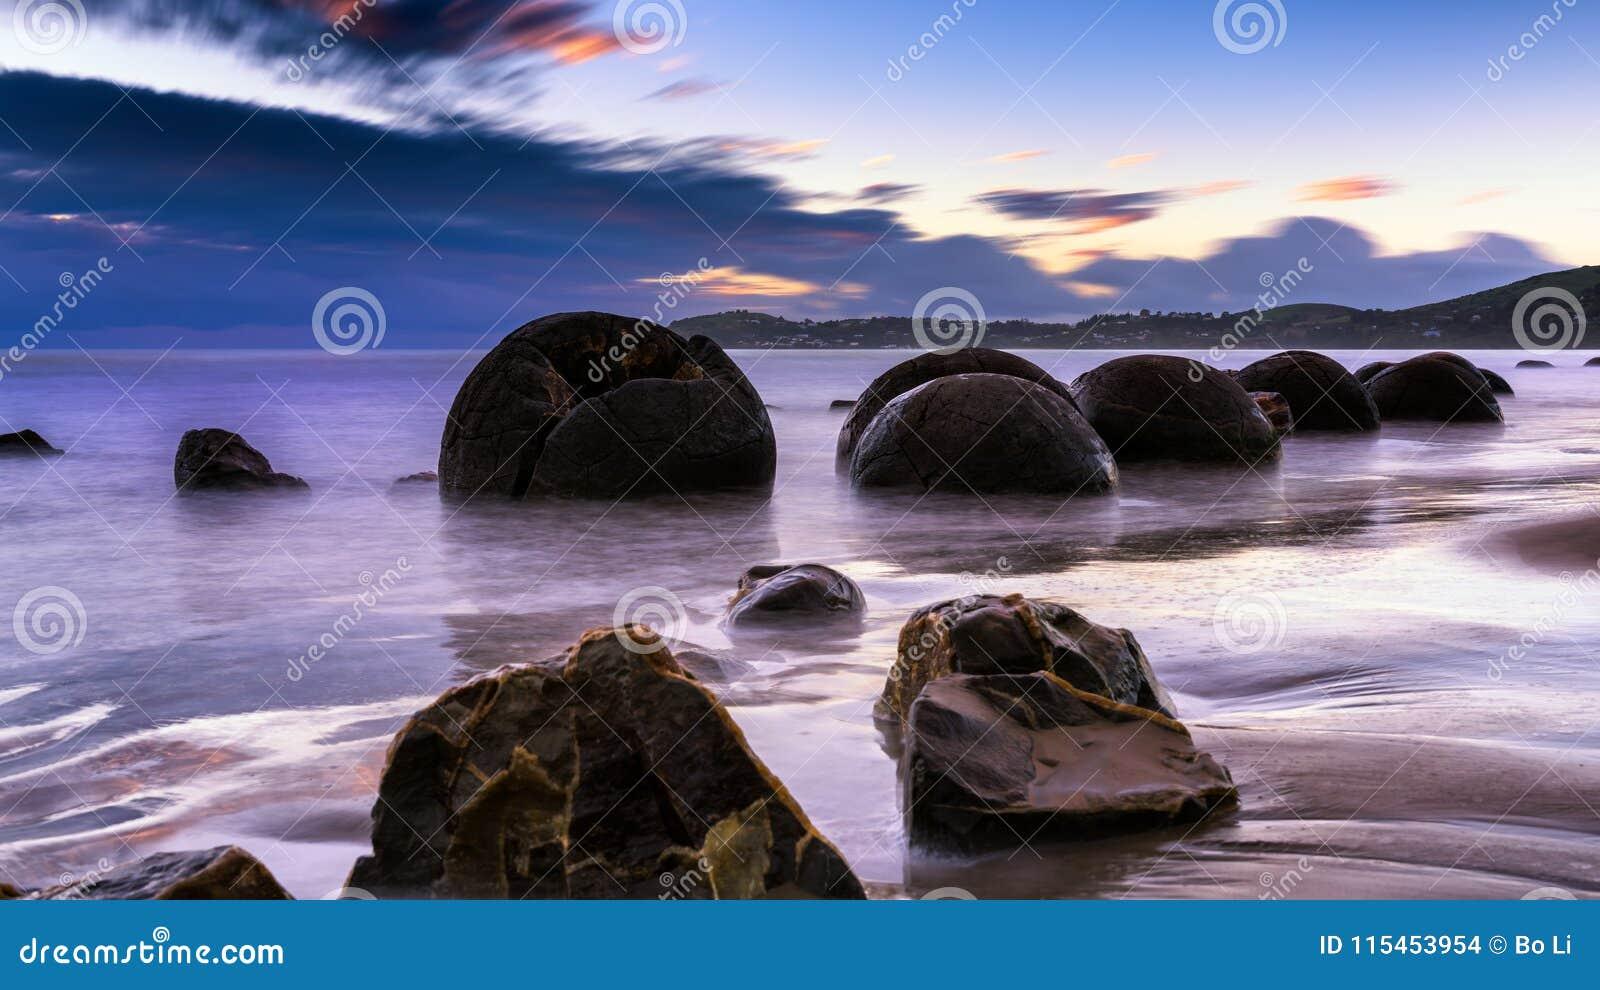 Moeraki Boulders at Sunrise